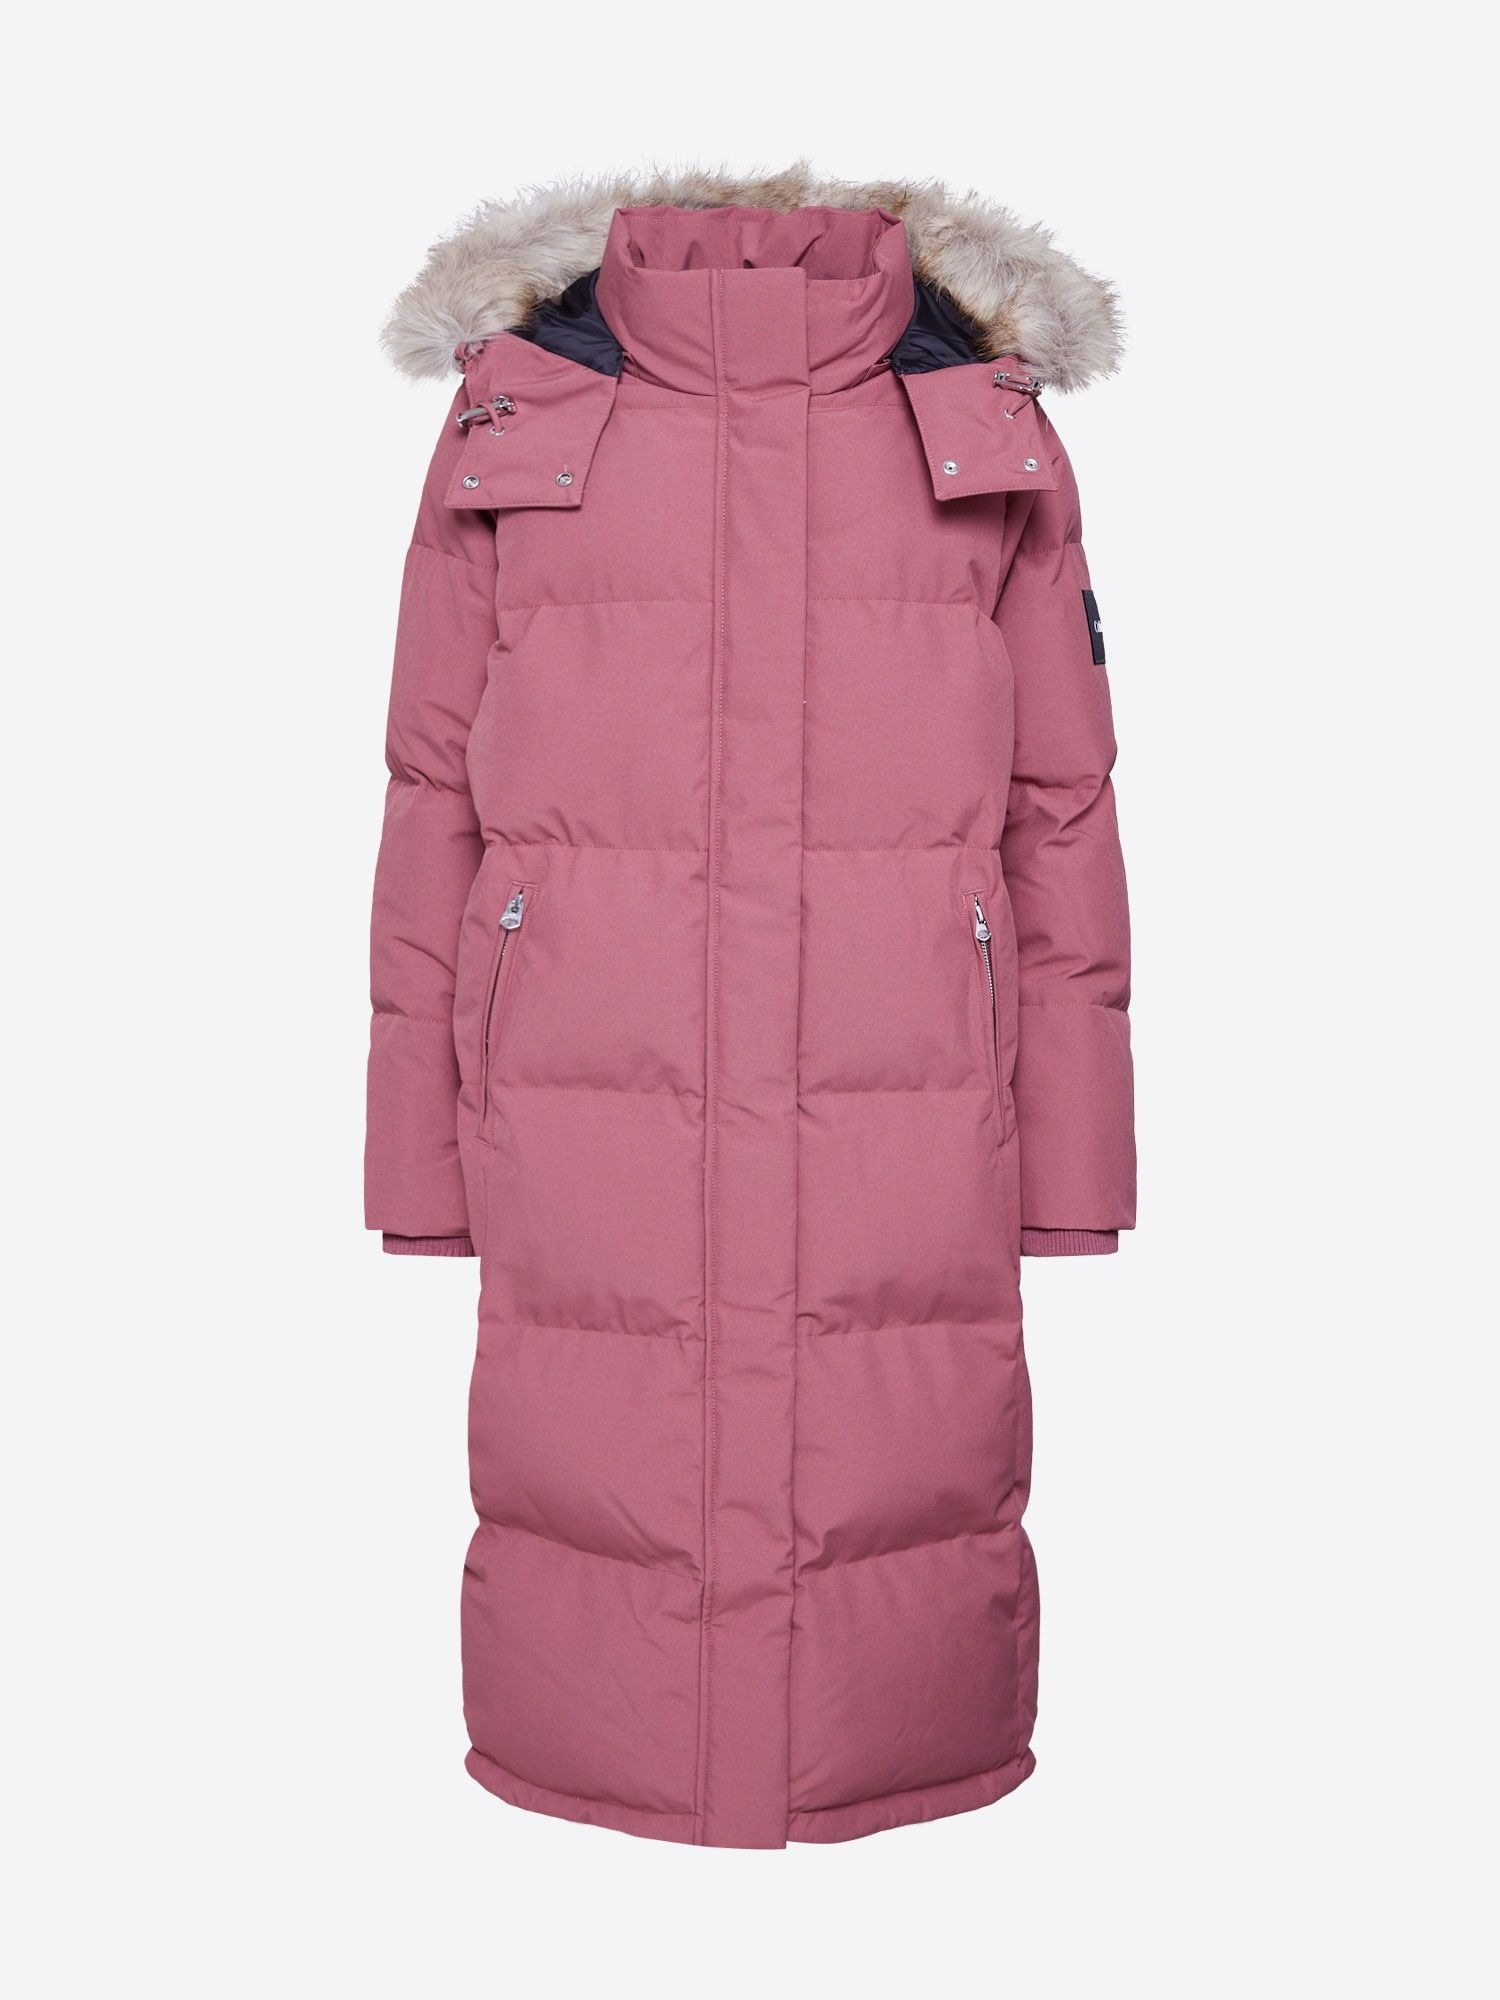 Calvin Klein Mantel Damen Rosa Grosse Xl Wintermantel Mantel Damen Und Mantel